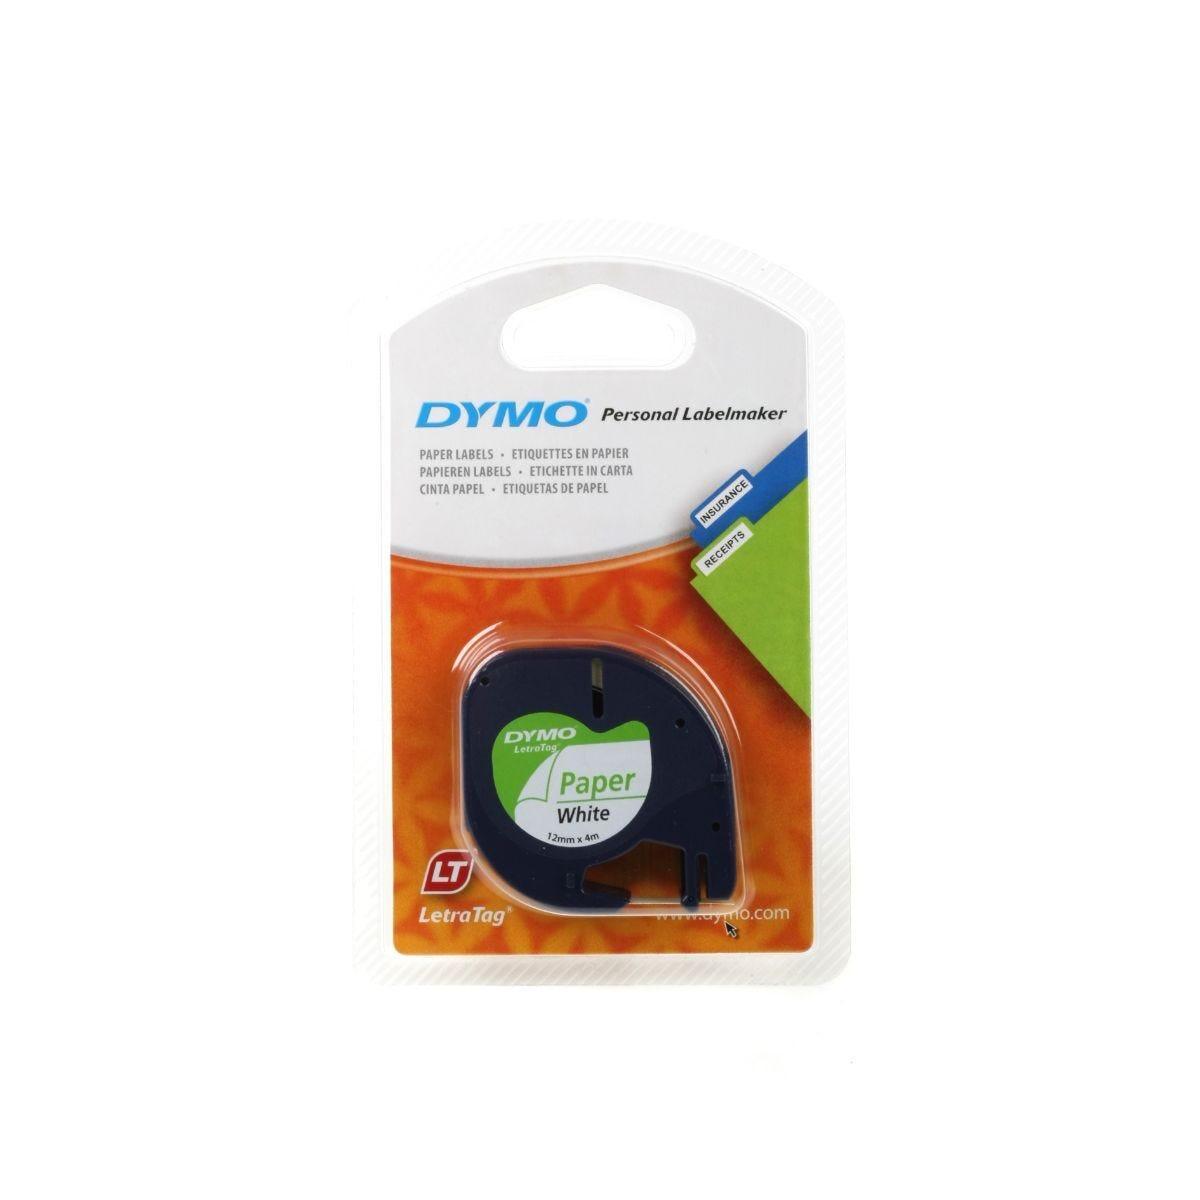 Dymo Letratag Tape 12mm x 4m Paper